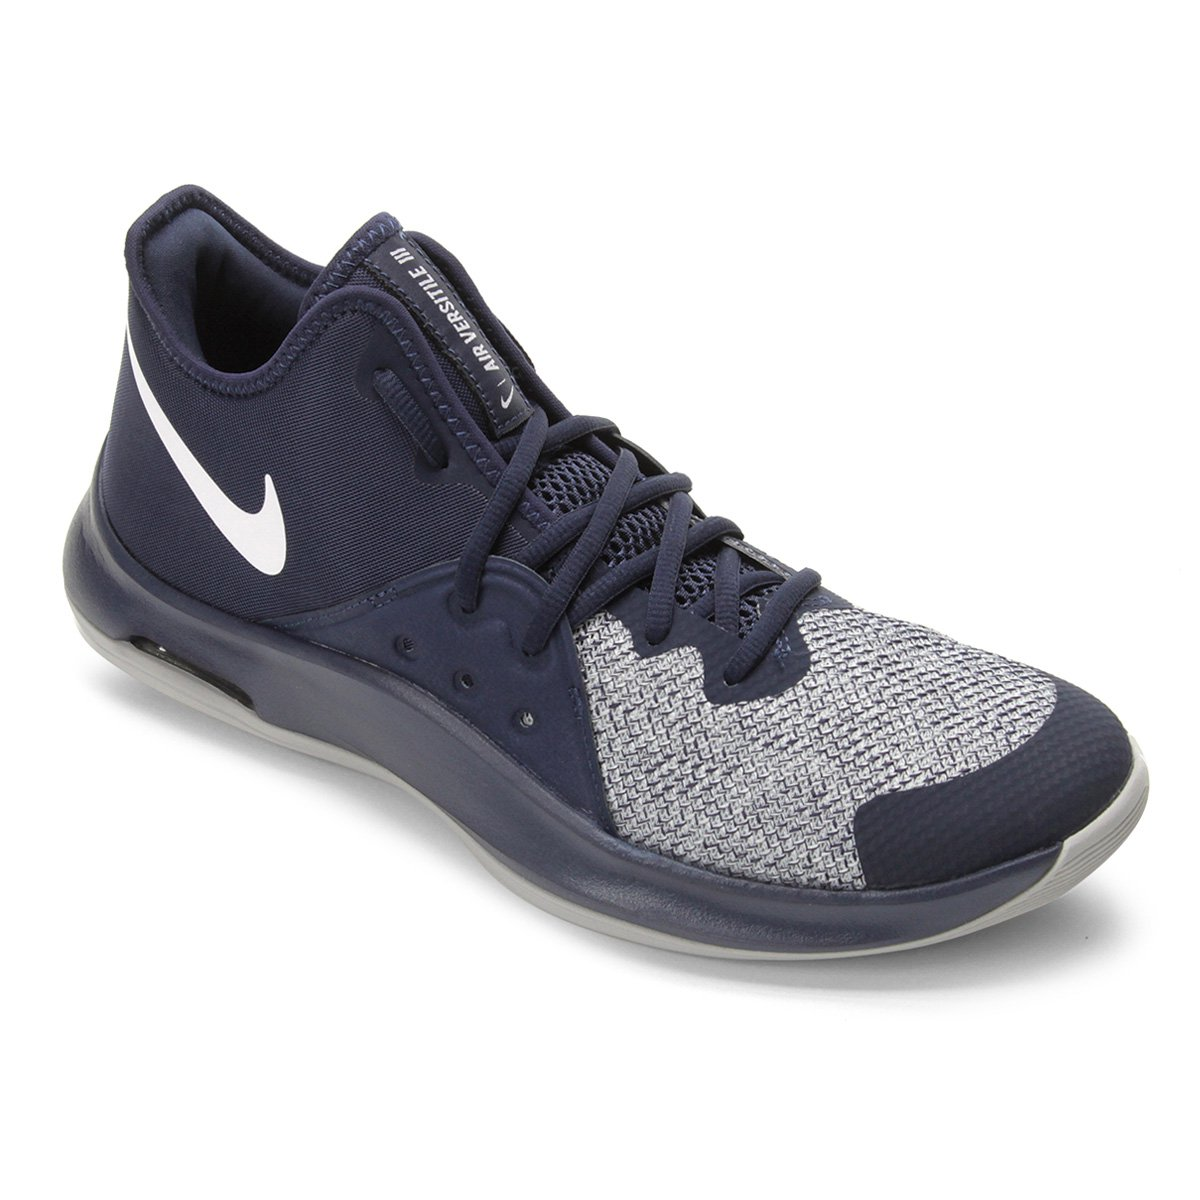 7244b2842121 Tênis Nike Air Versitile III Masculino - Marinho e Cinza - Compre Agora